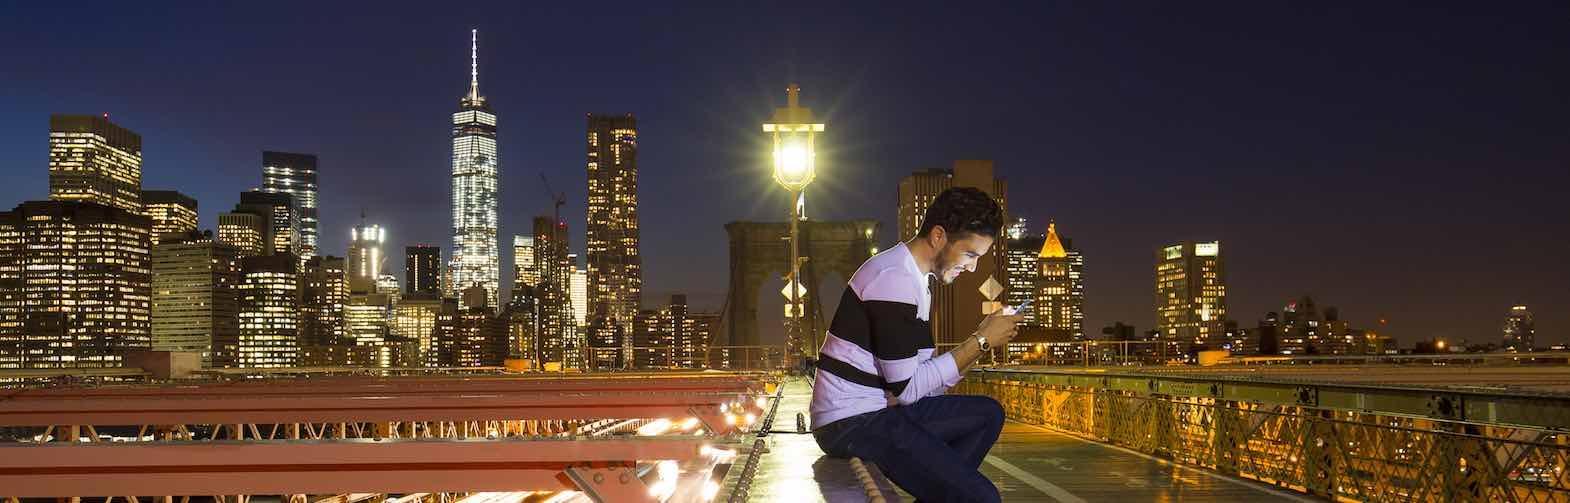 Man sitting on bridge at night